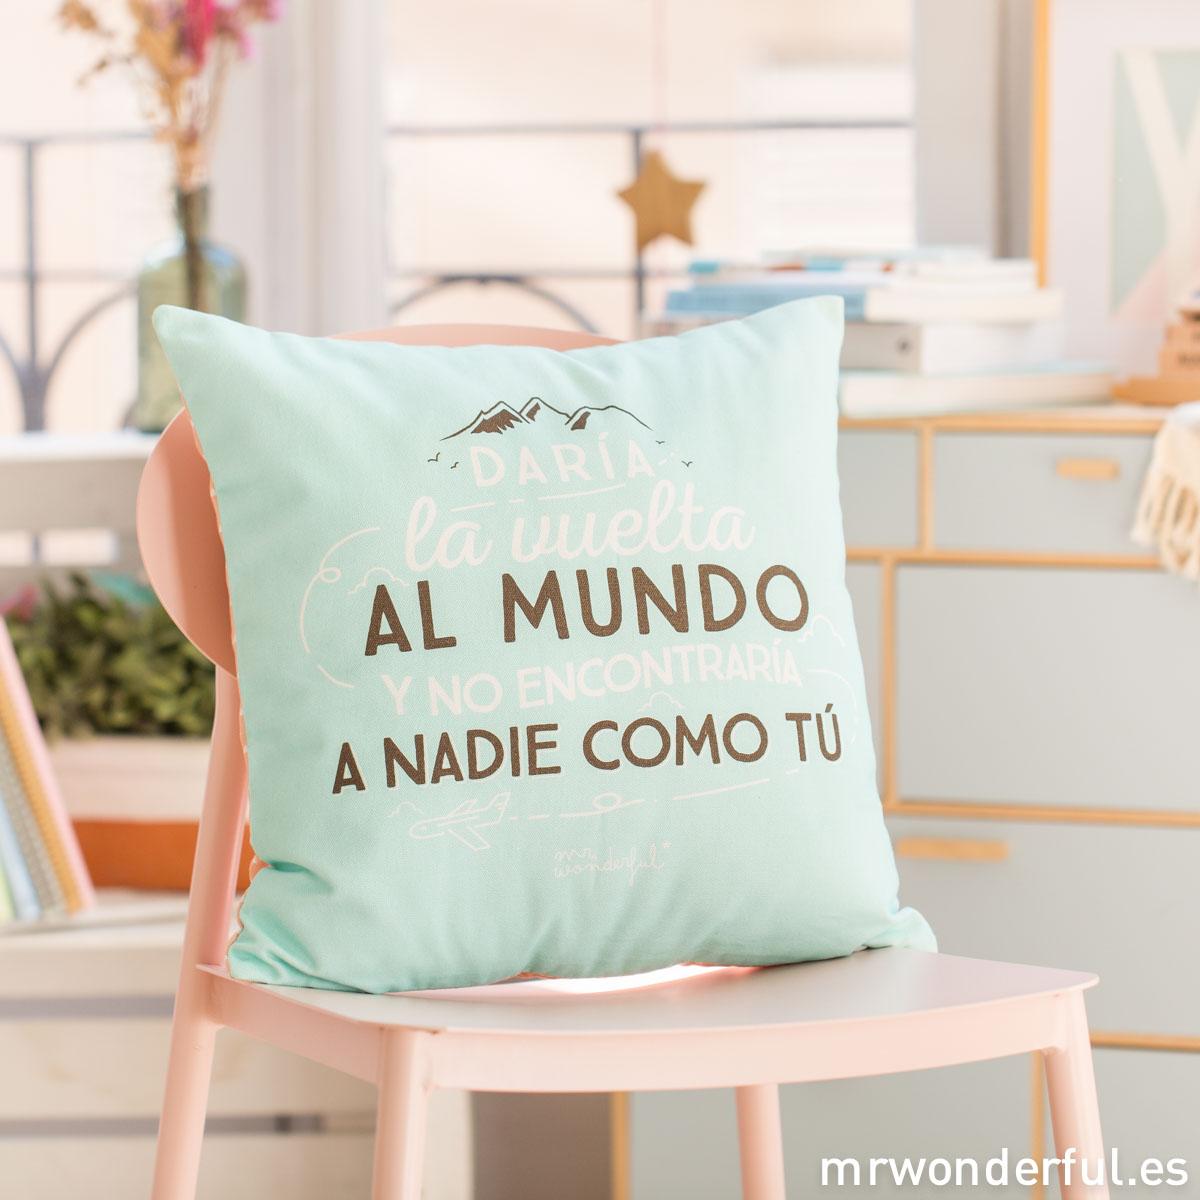 mrwonderful_WOA02940_8436547193714_Funda-de-cojin-Daria-la-vuelta-al-mundo-12